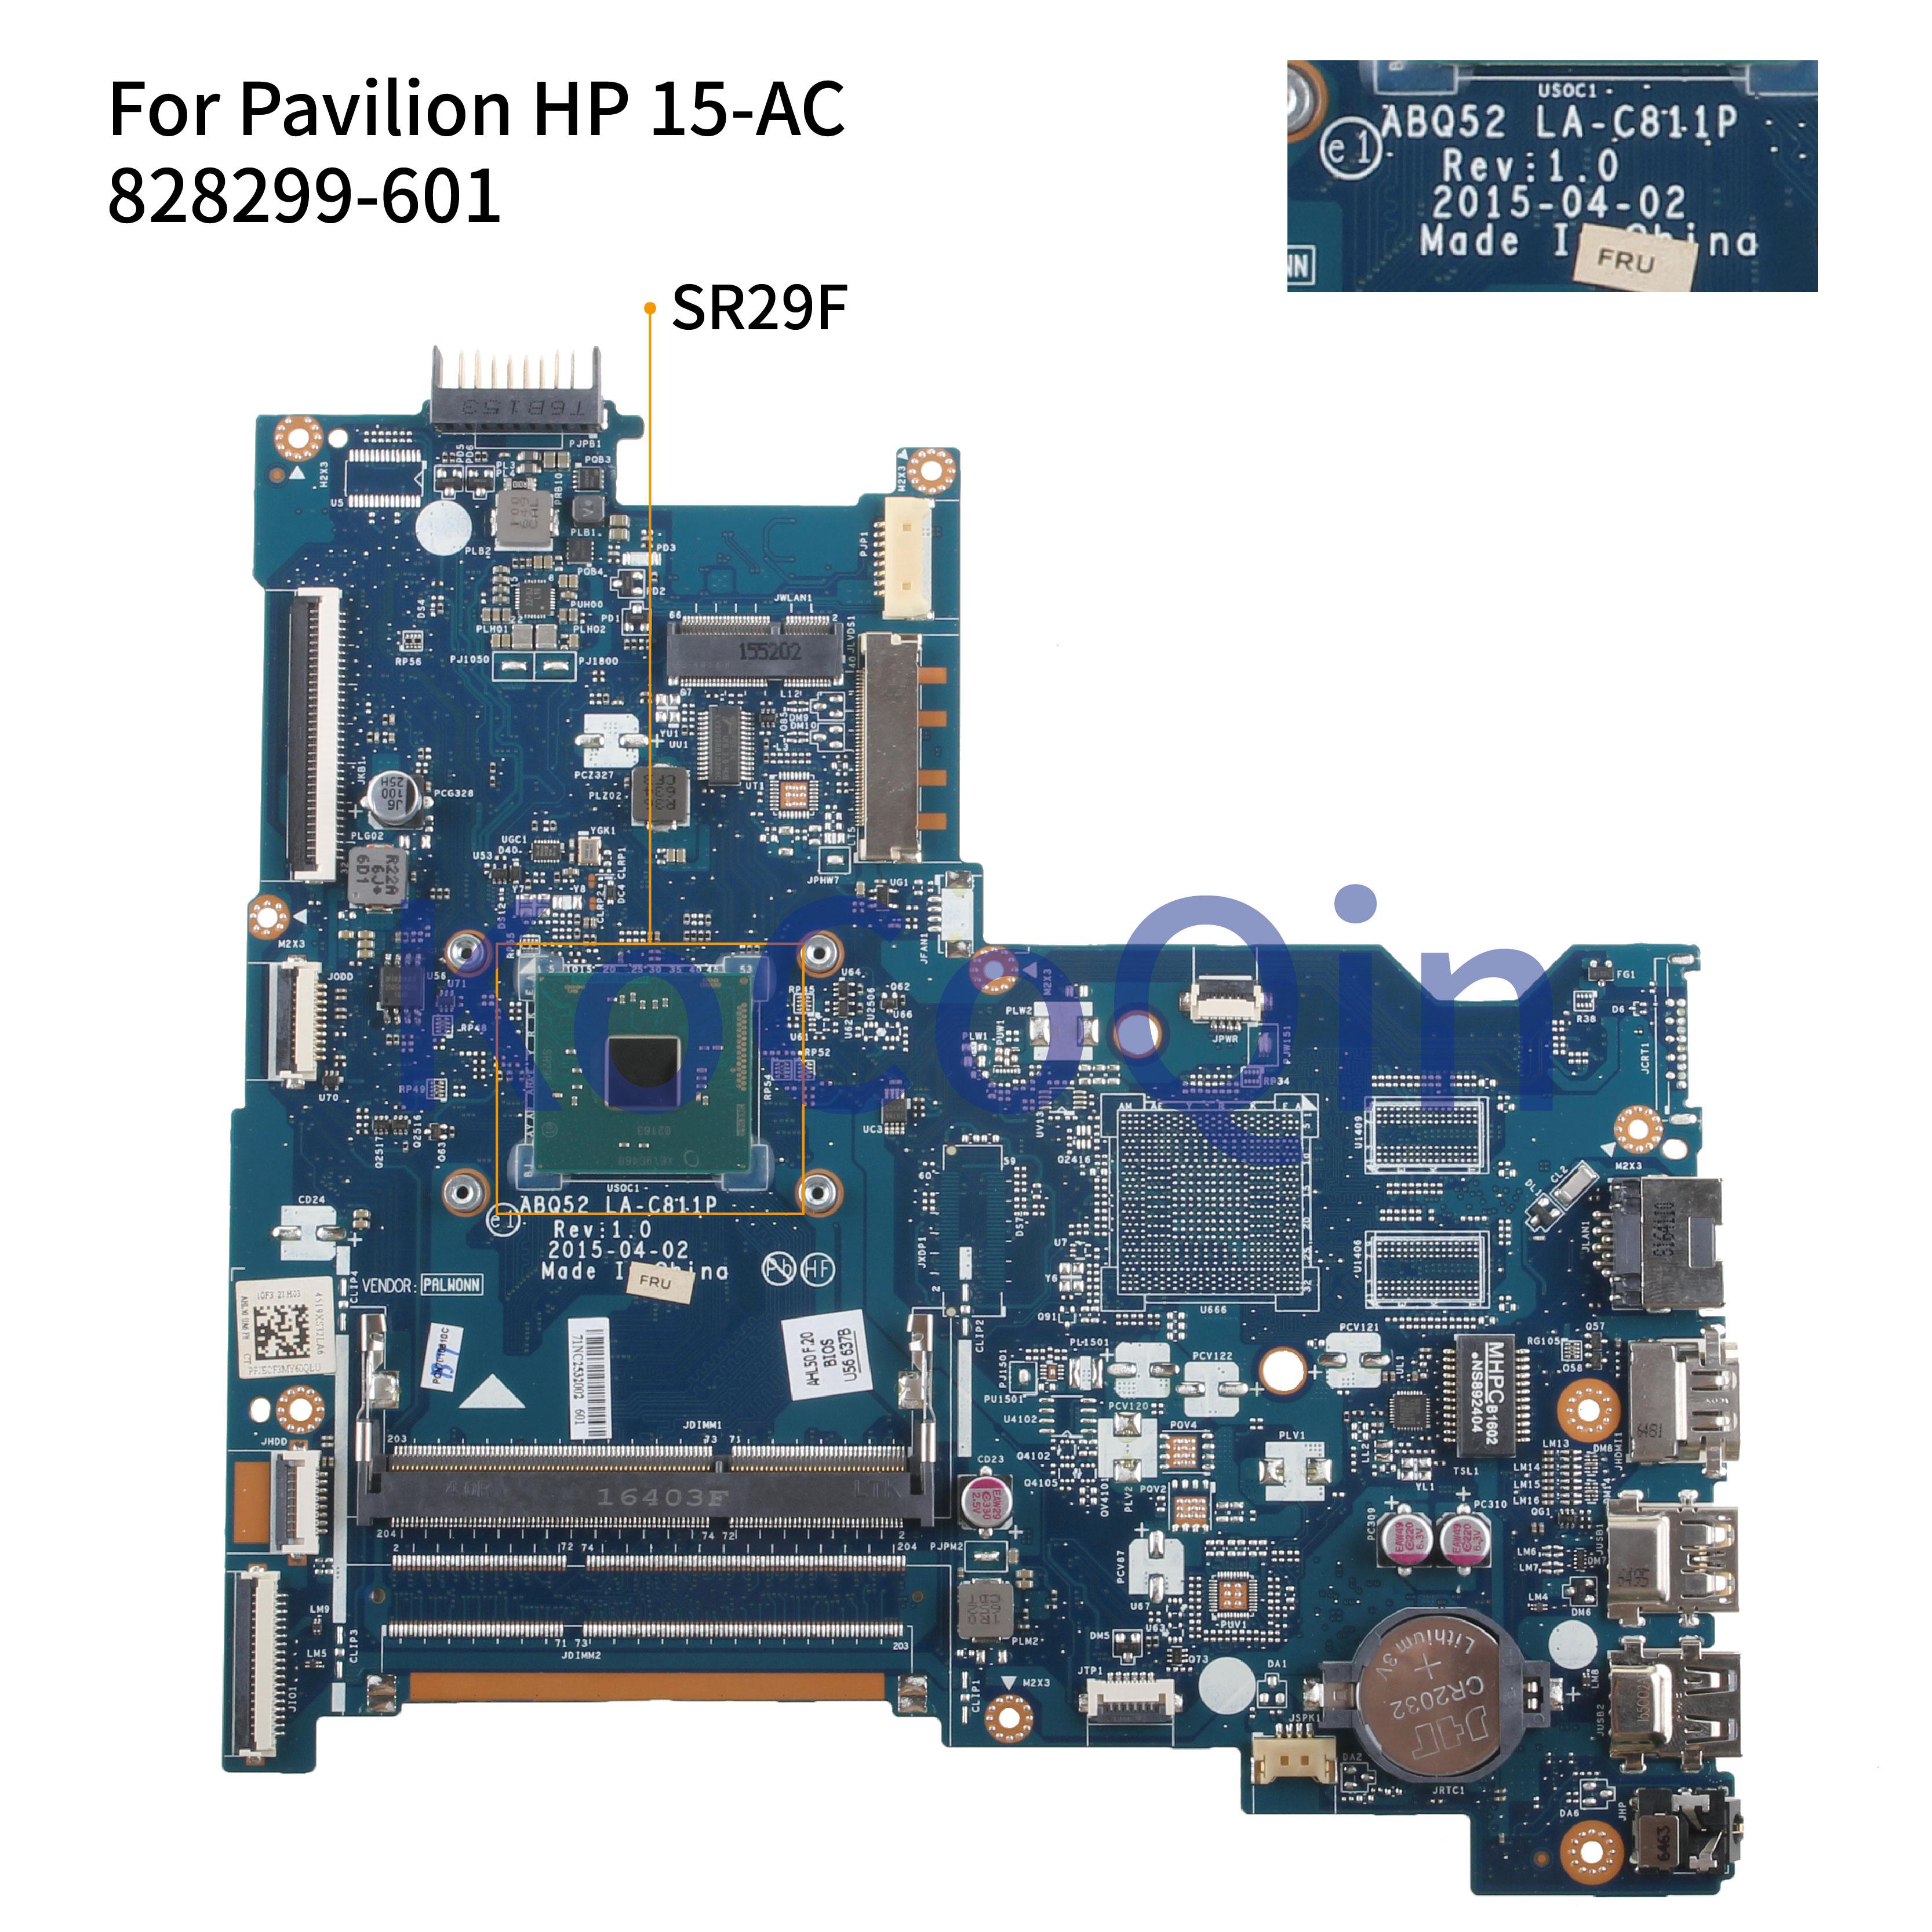 KoCoQin Laptop Motherboard For HP Pavilion 250 256 G4 15-AC Core N3150 Mainboard ABQ52 LA-C811P 828299-001 815248-001 SR29F CPU